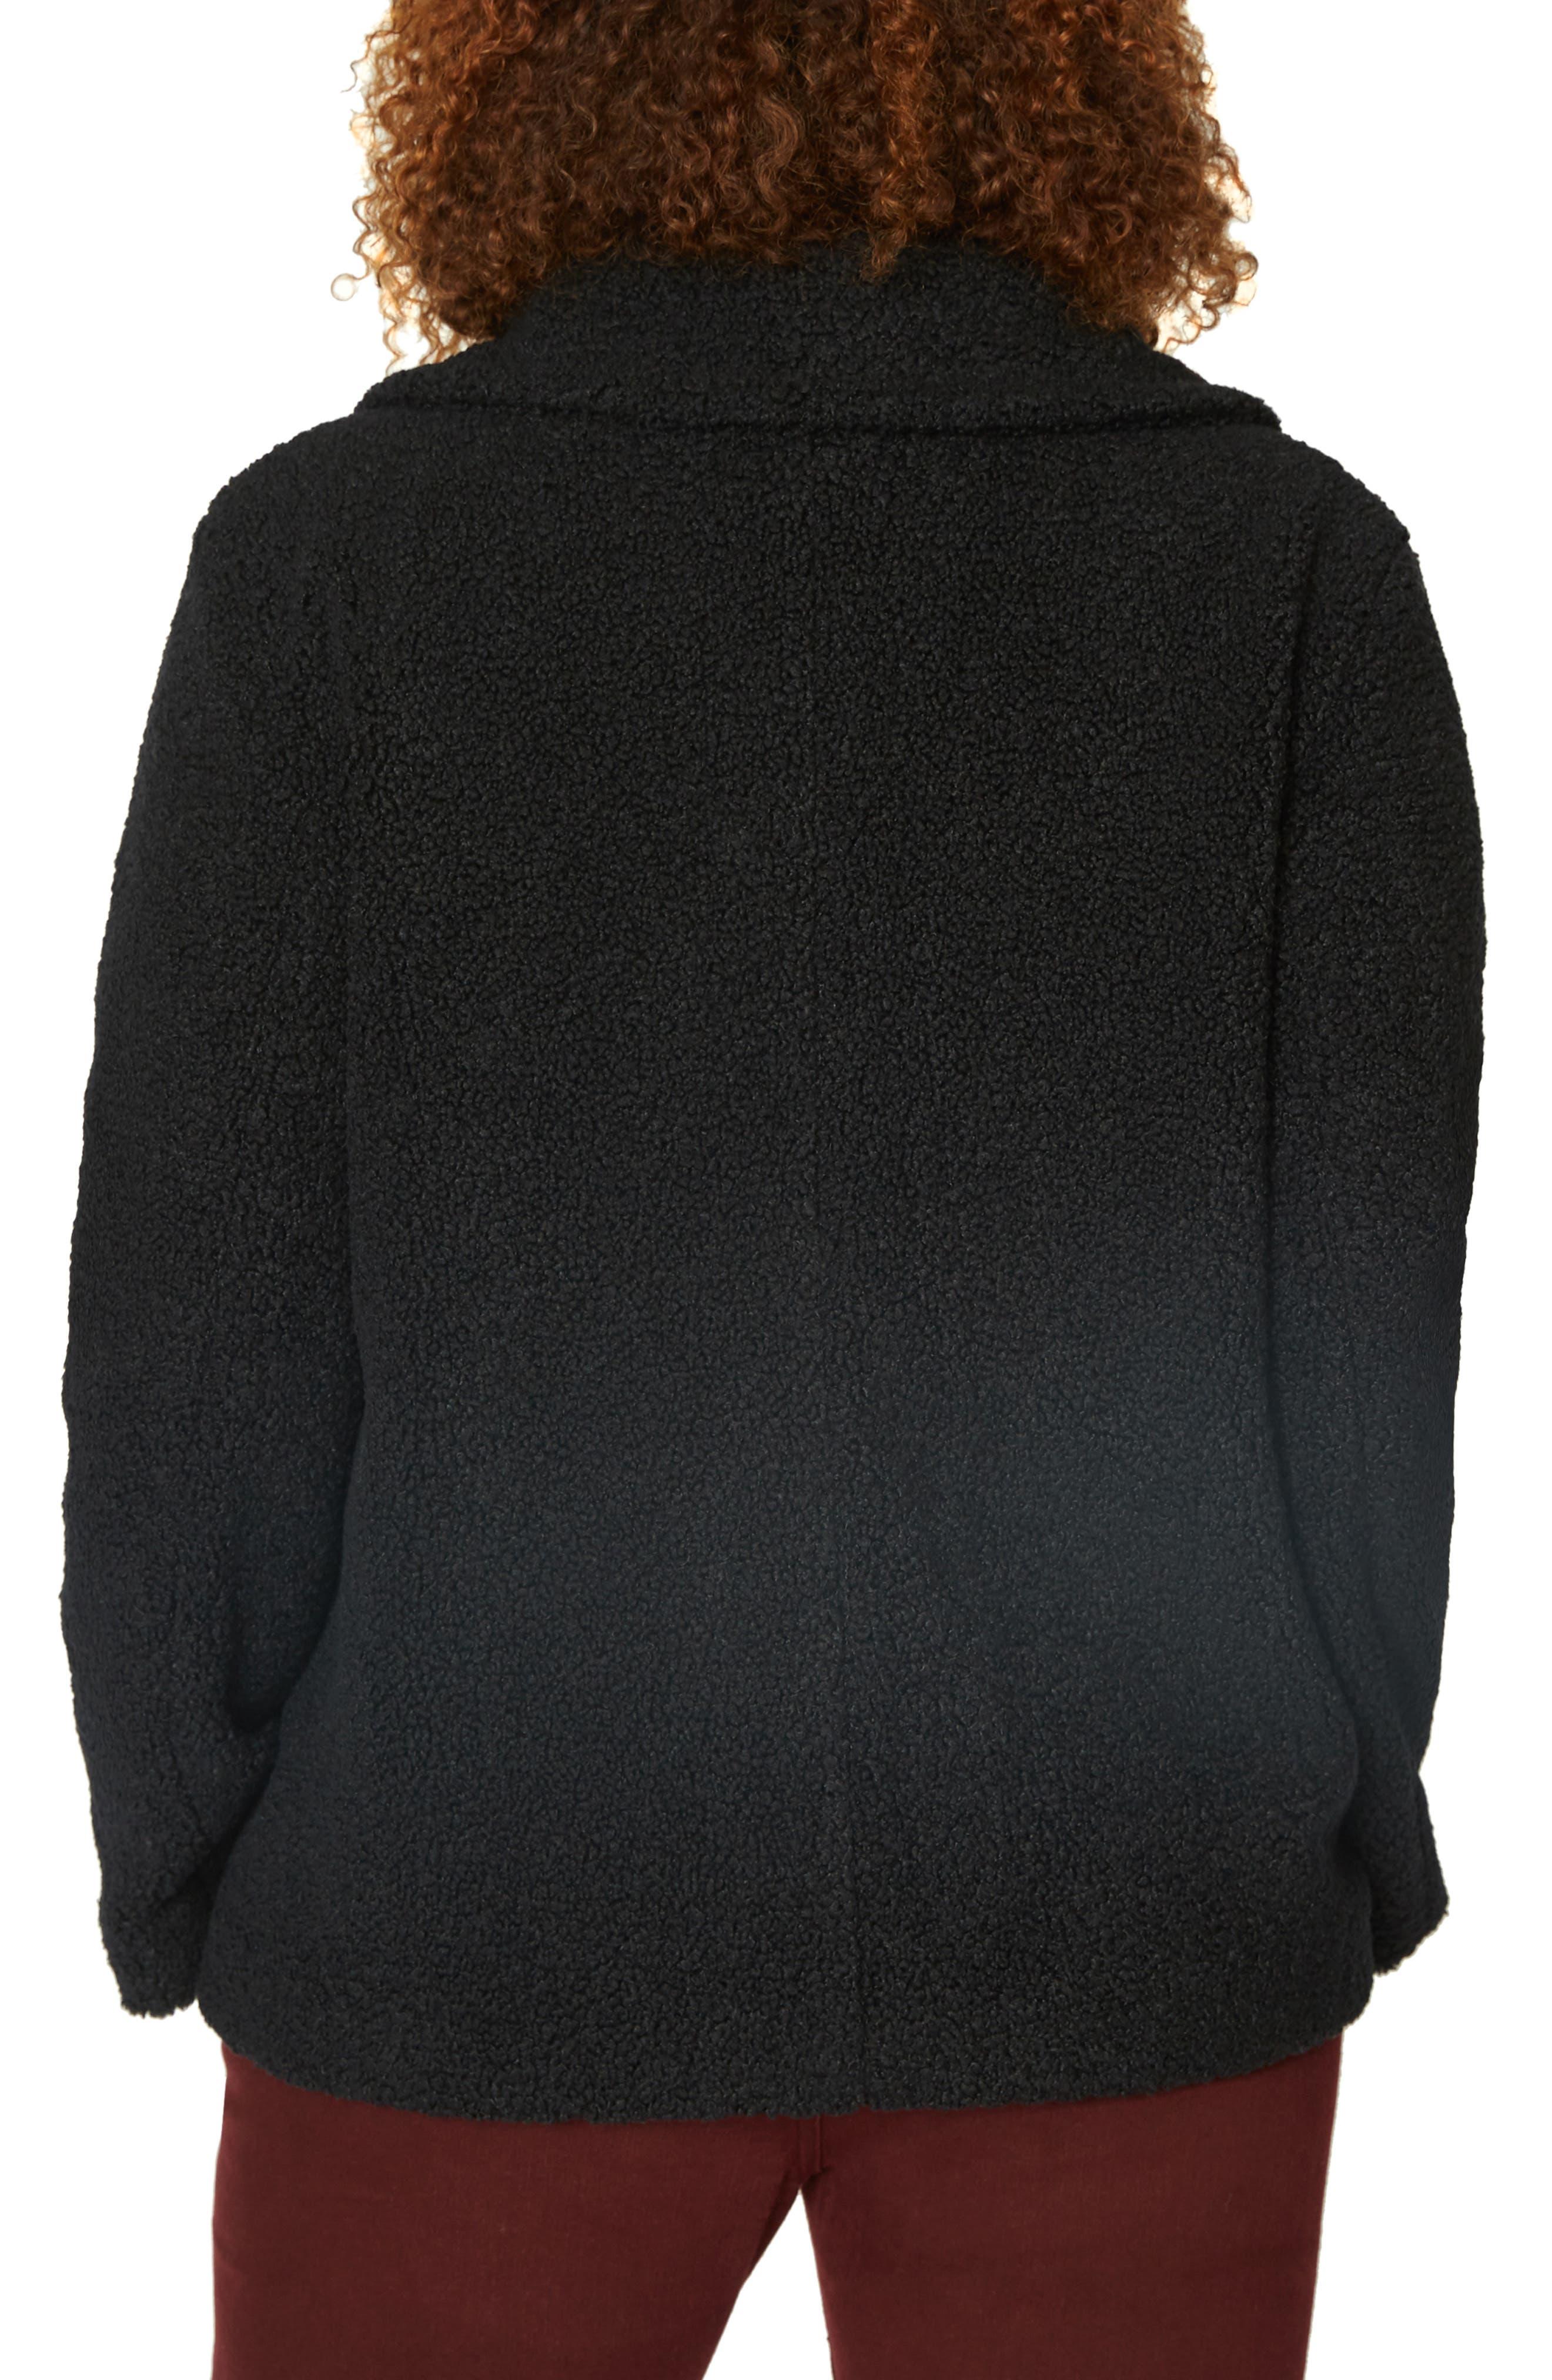 Free Spirit Faux Shearling Coat,                             Alternate thumbnail 2, color,                             BLACK